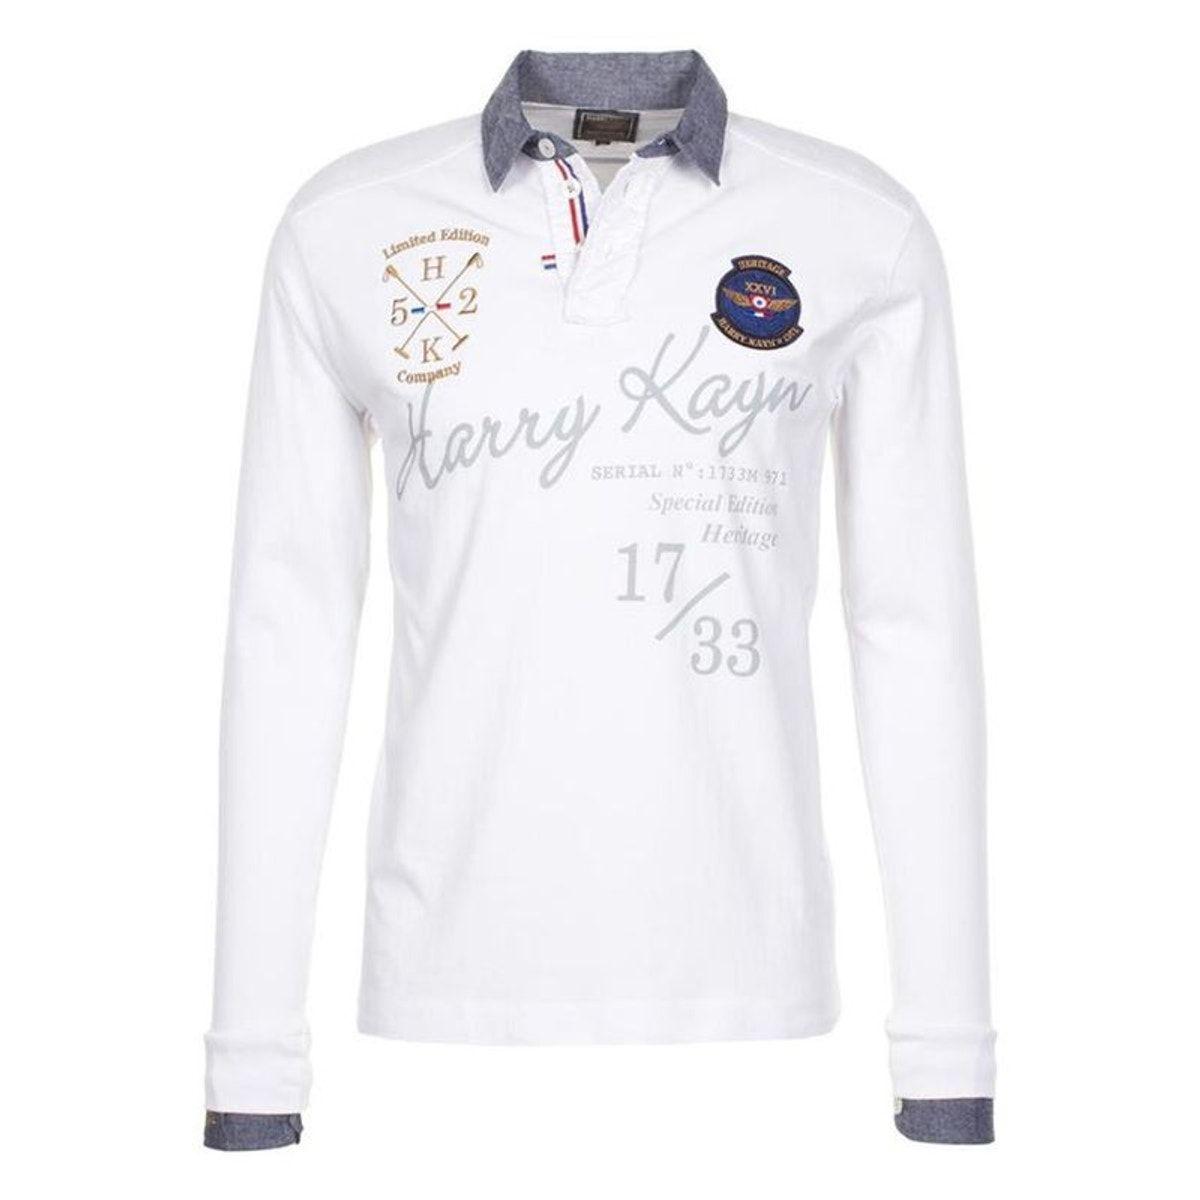 Harry Kayn polo Homme Cazbi Blanc Taille : L;XXL;XL